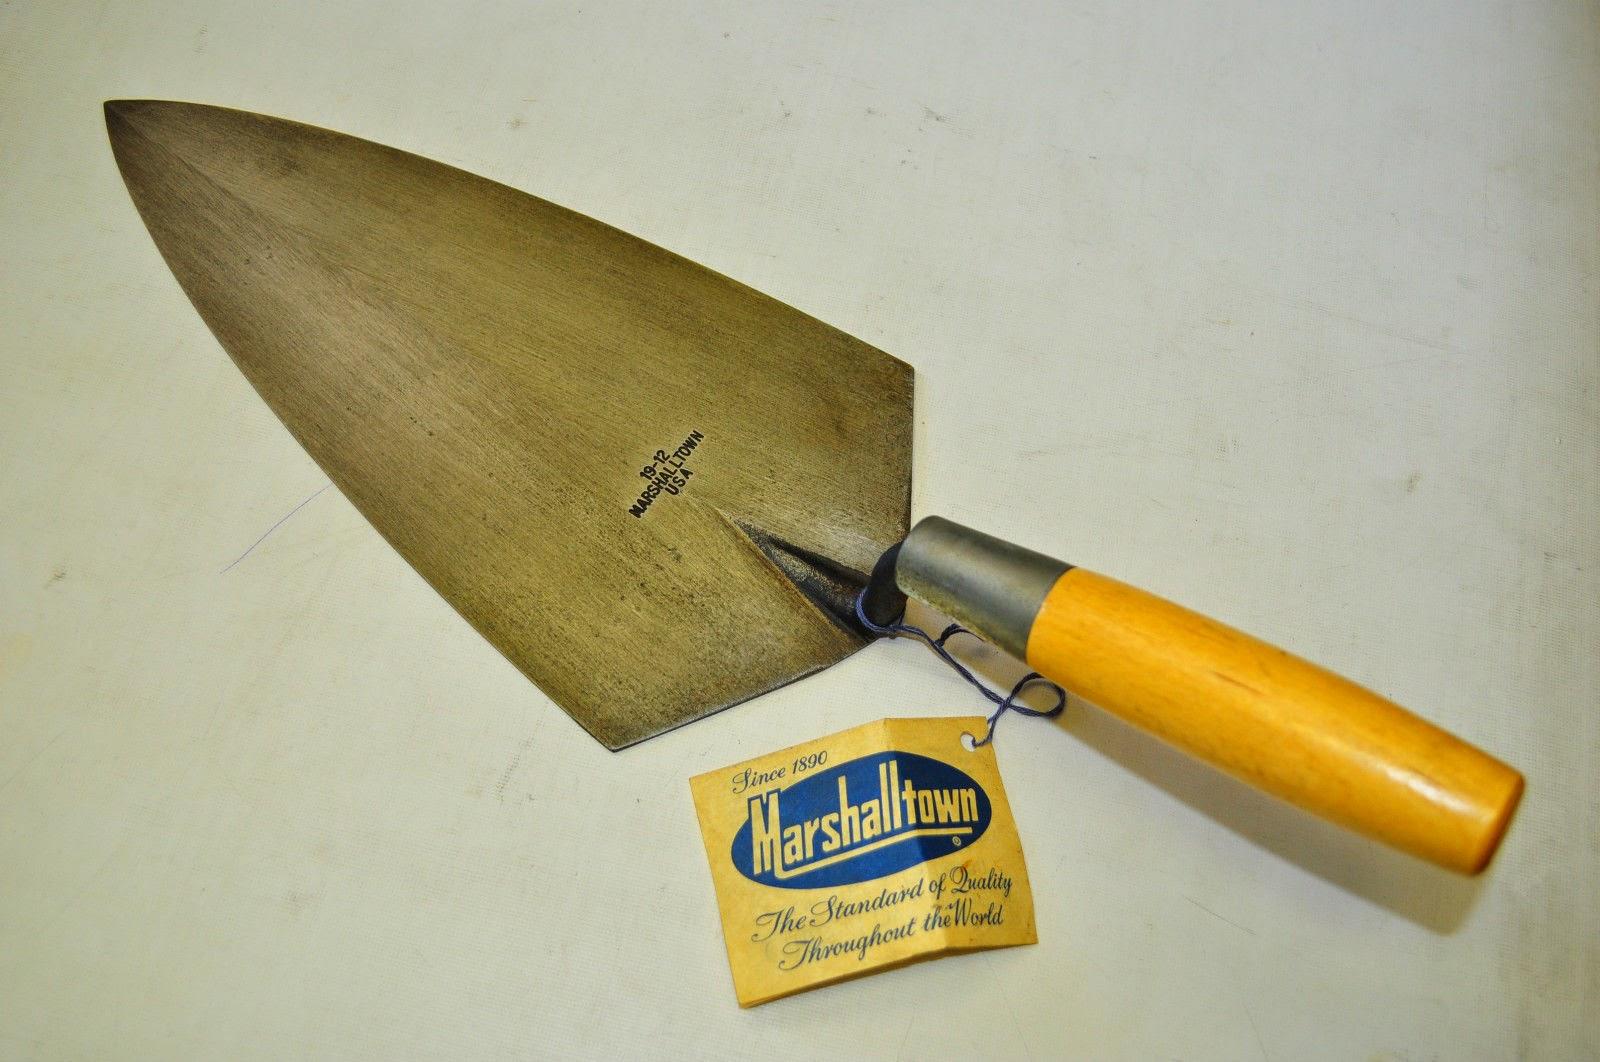 Marshalltown tools coupon code